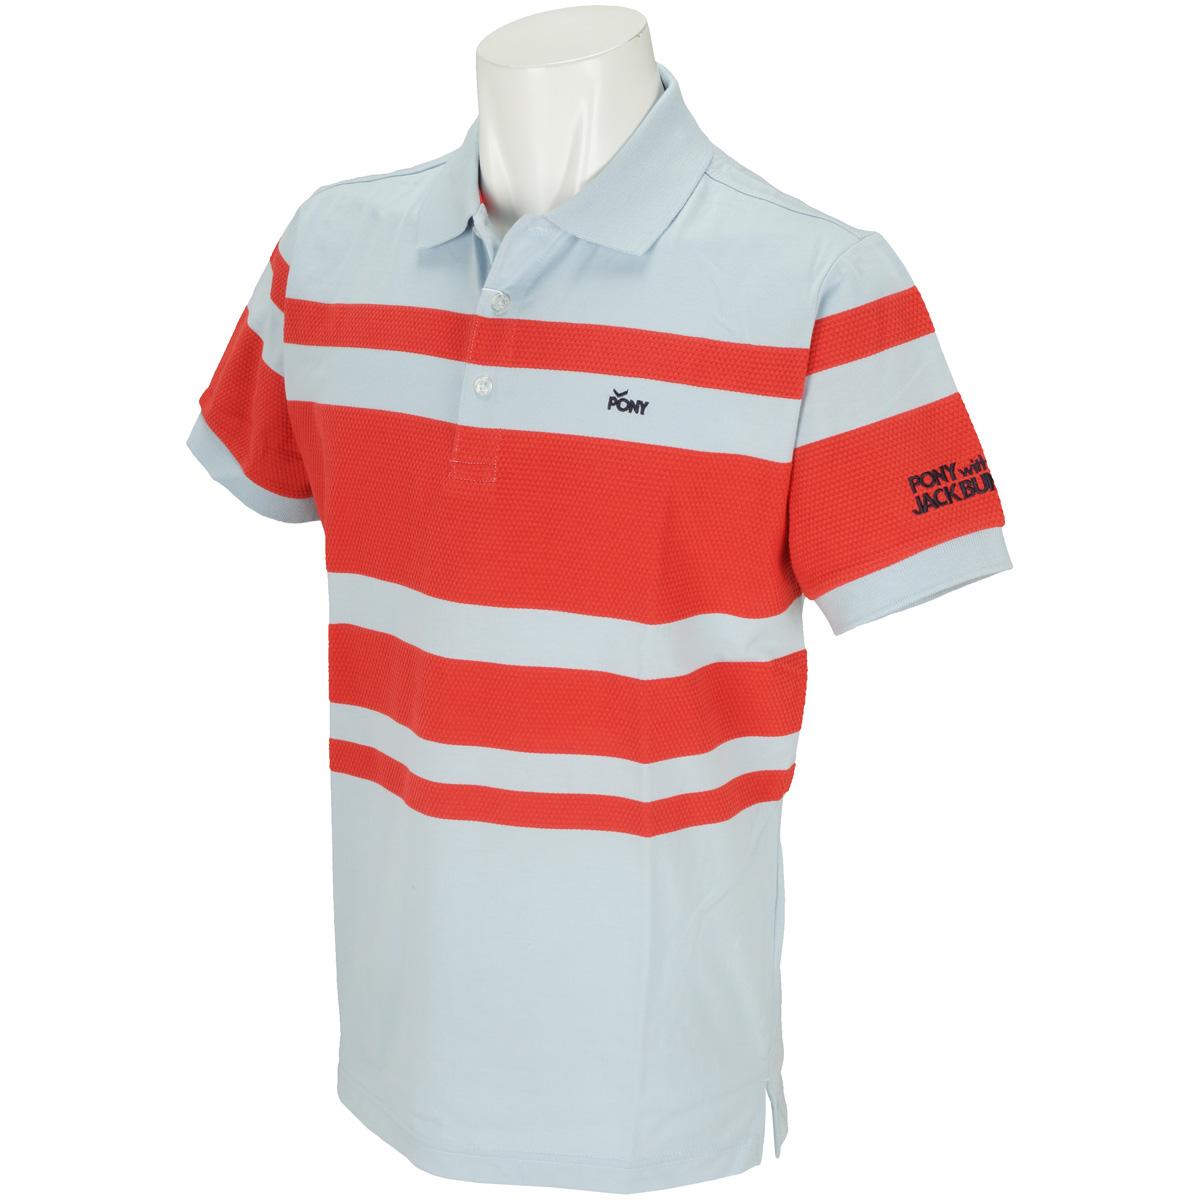 PONY 変形パネルボーダー 半袖ポロシャツ